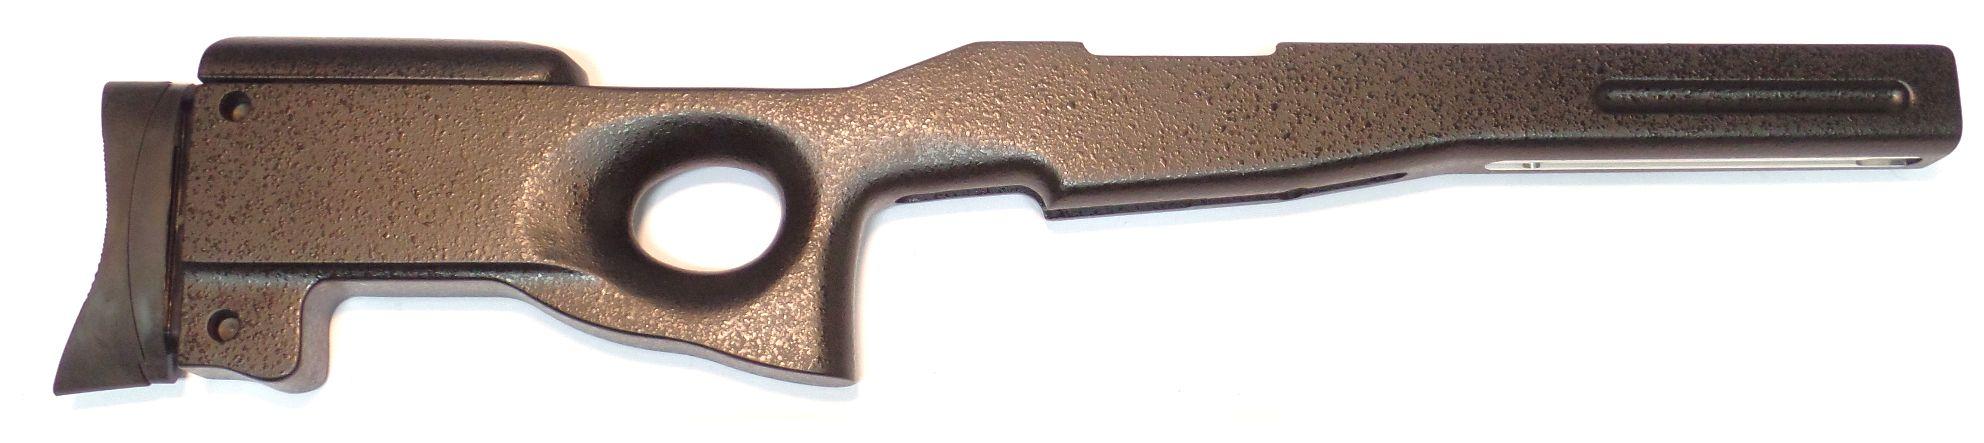 CROSSE SNIPER Mosin Nagant 91/30